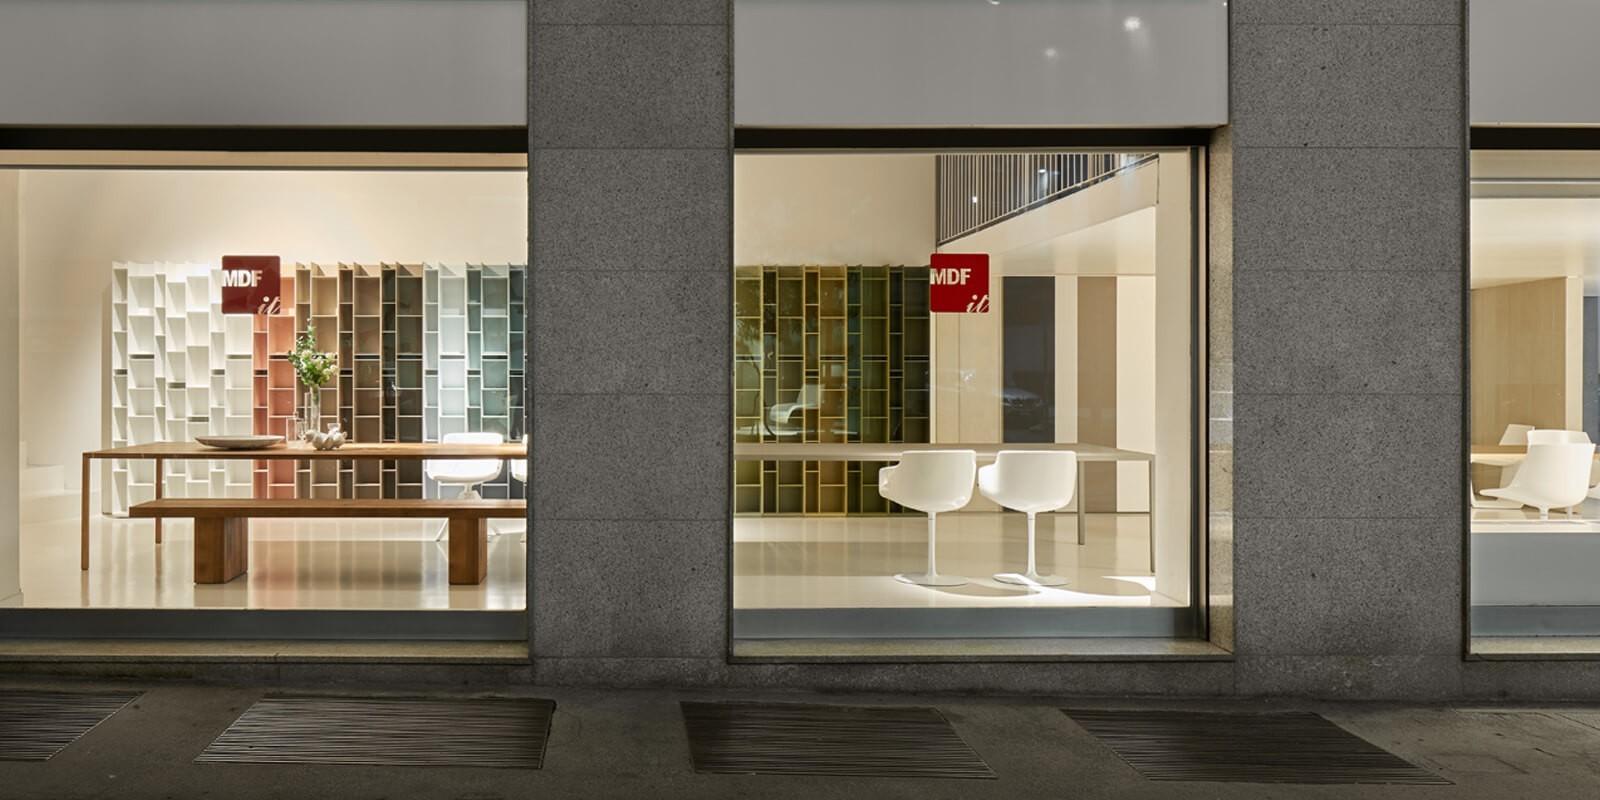 Showroom a milano arredamento dal design unico mdf italia for Showroom arredamento roma